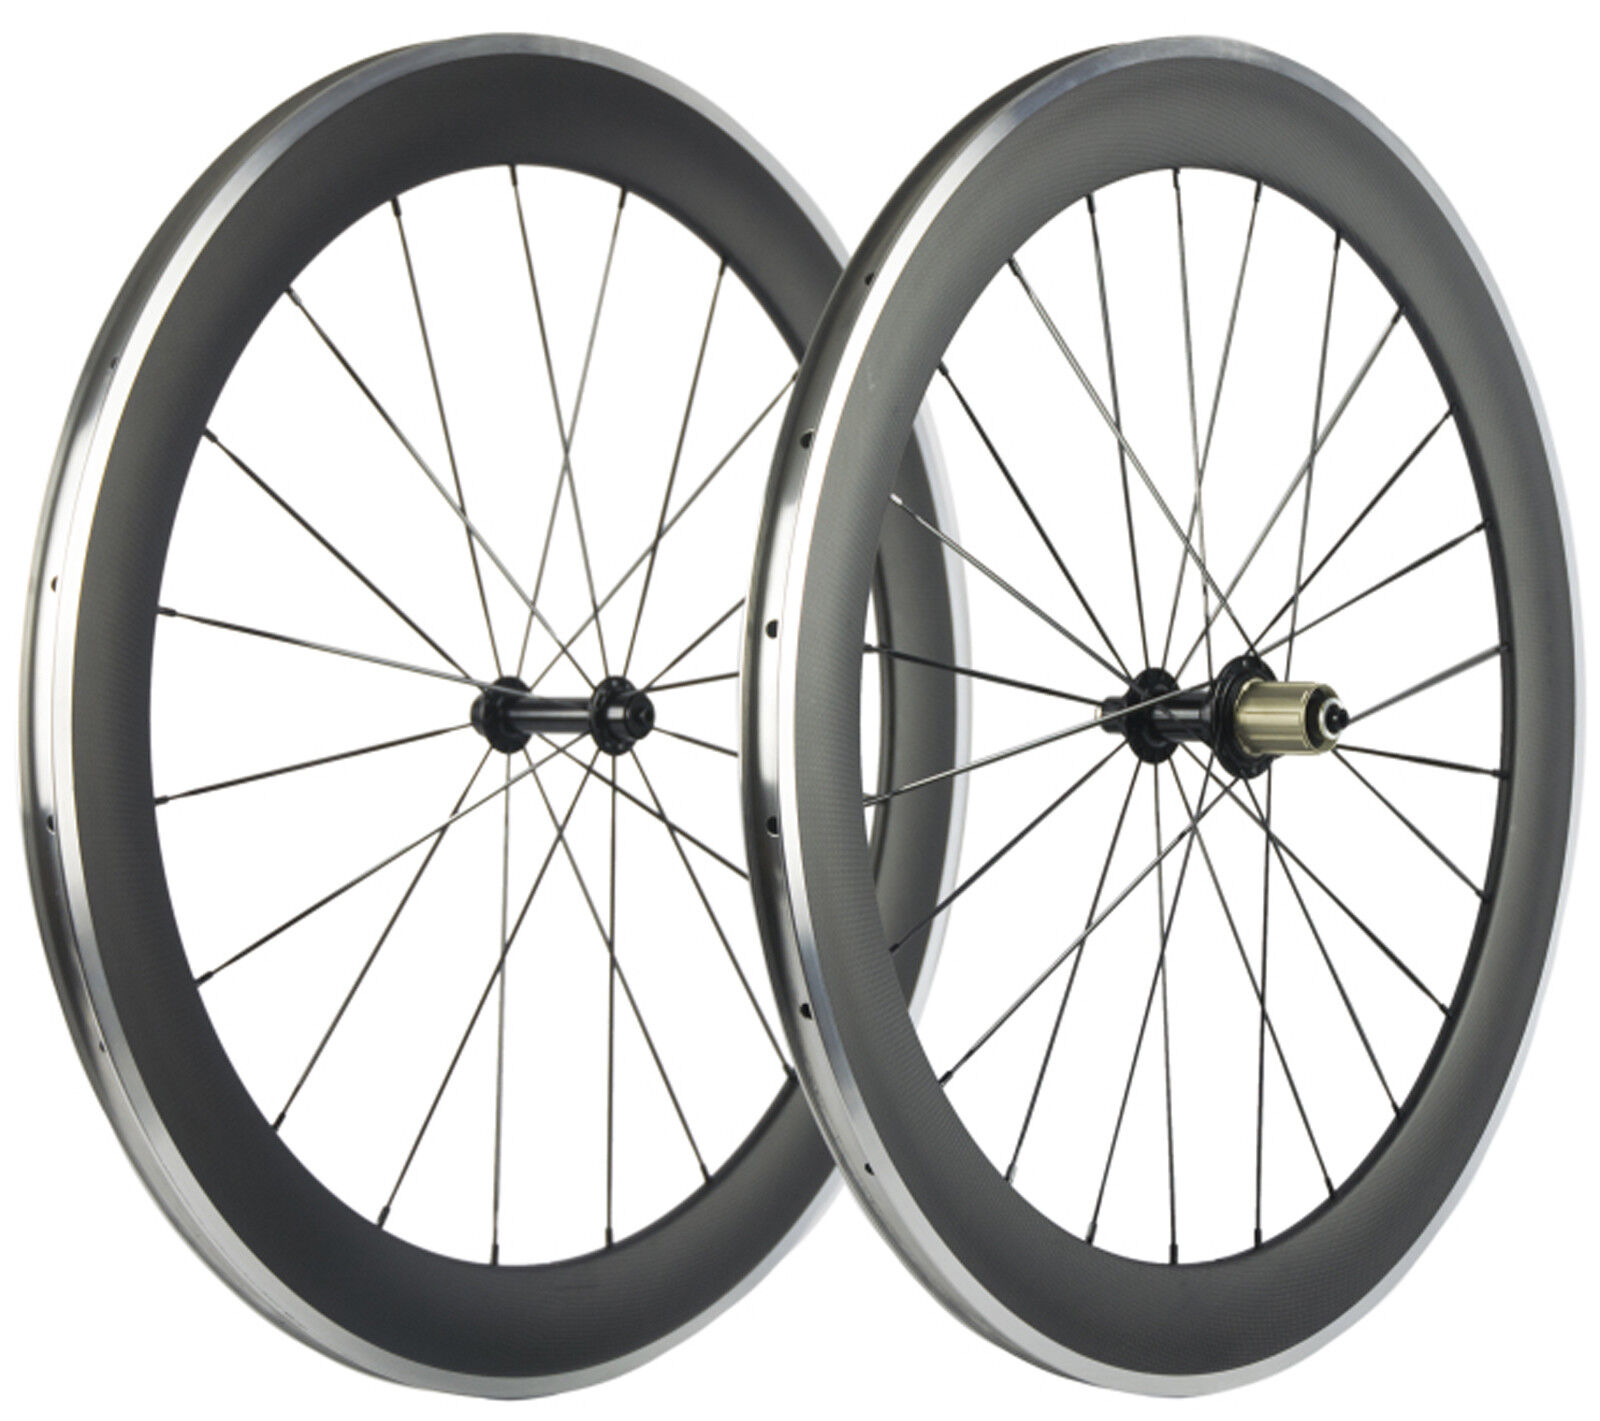 60mm Clincher Bicycle Wheels Aluminum Brake Surface Carbon Bike  Wheelset 700C  support wholesale retail